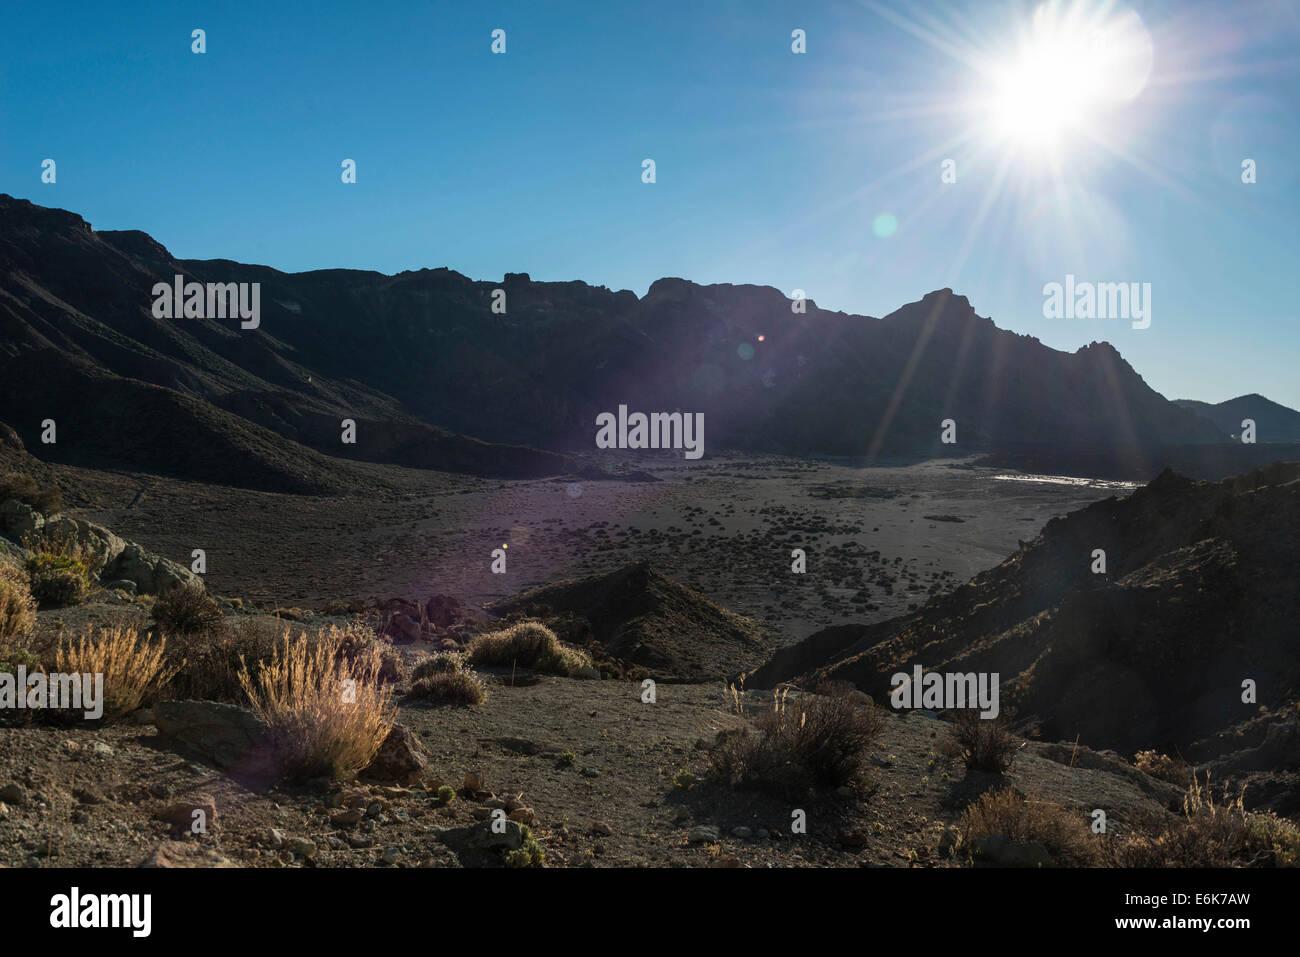 Volcanic landscape, Llano de Uruanca, plateau, Parque Nacional de las Cañadas del Teide, Teide National Park - Stock Image